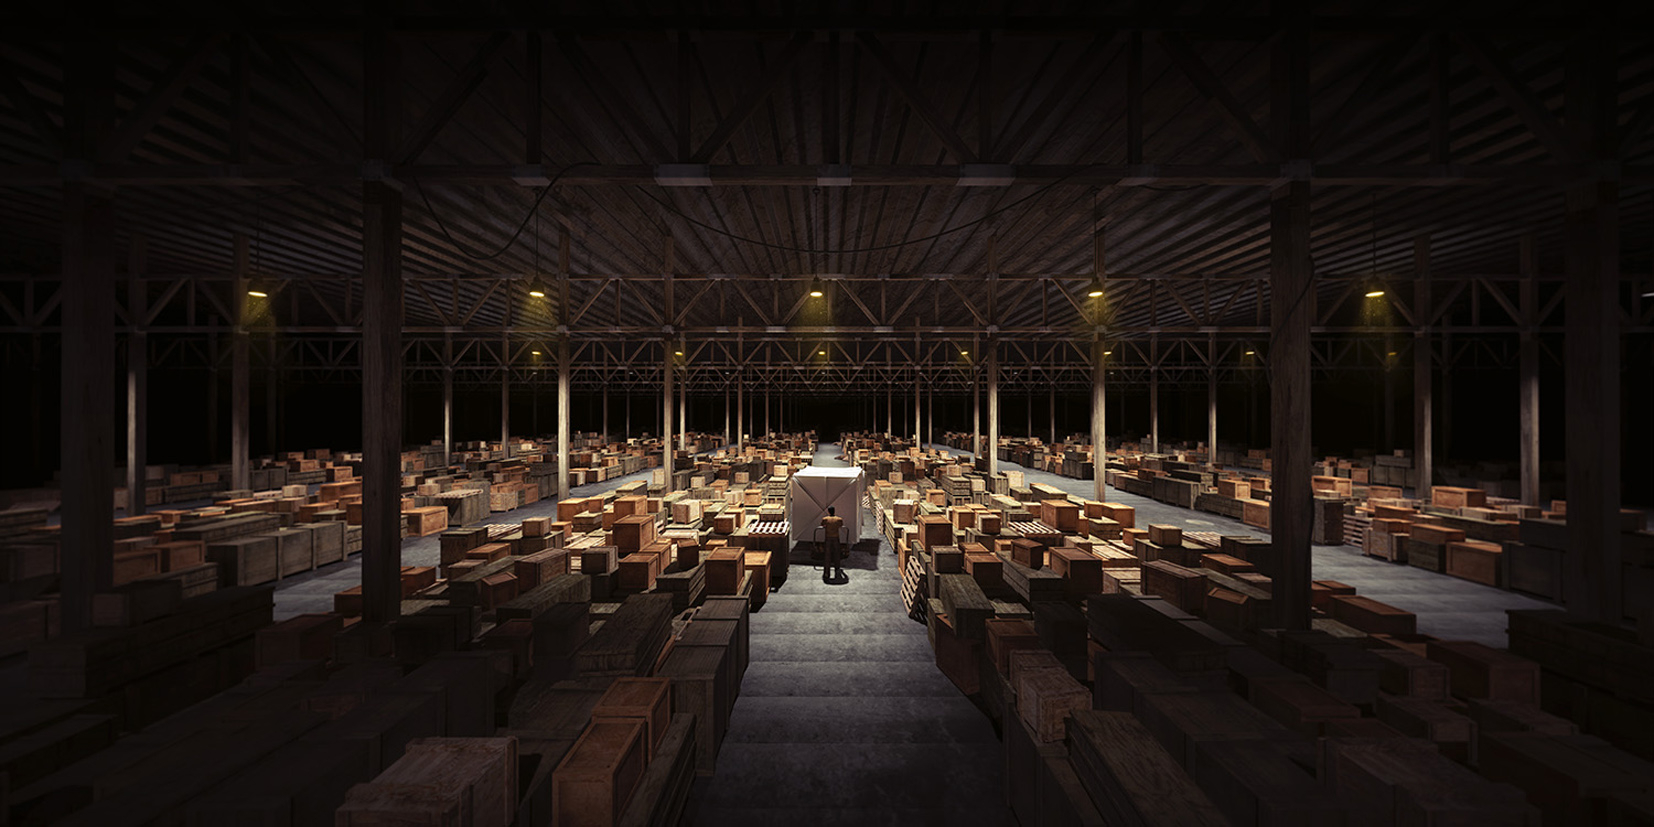 Warehouse / Popular Science